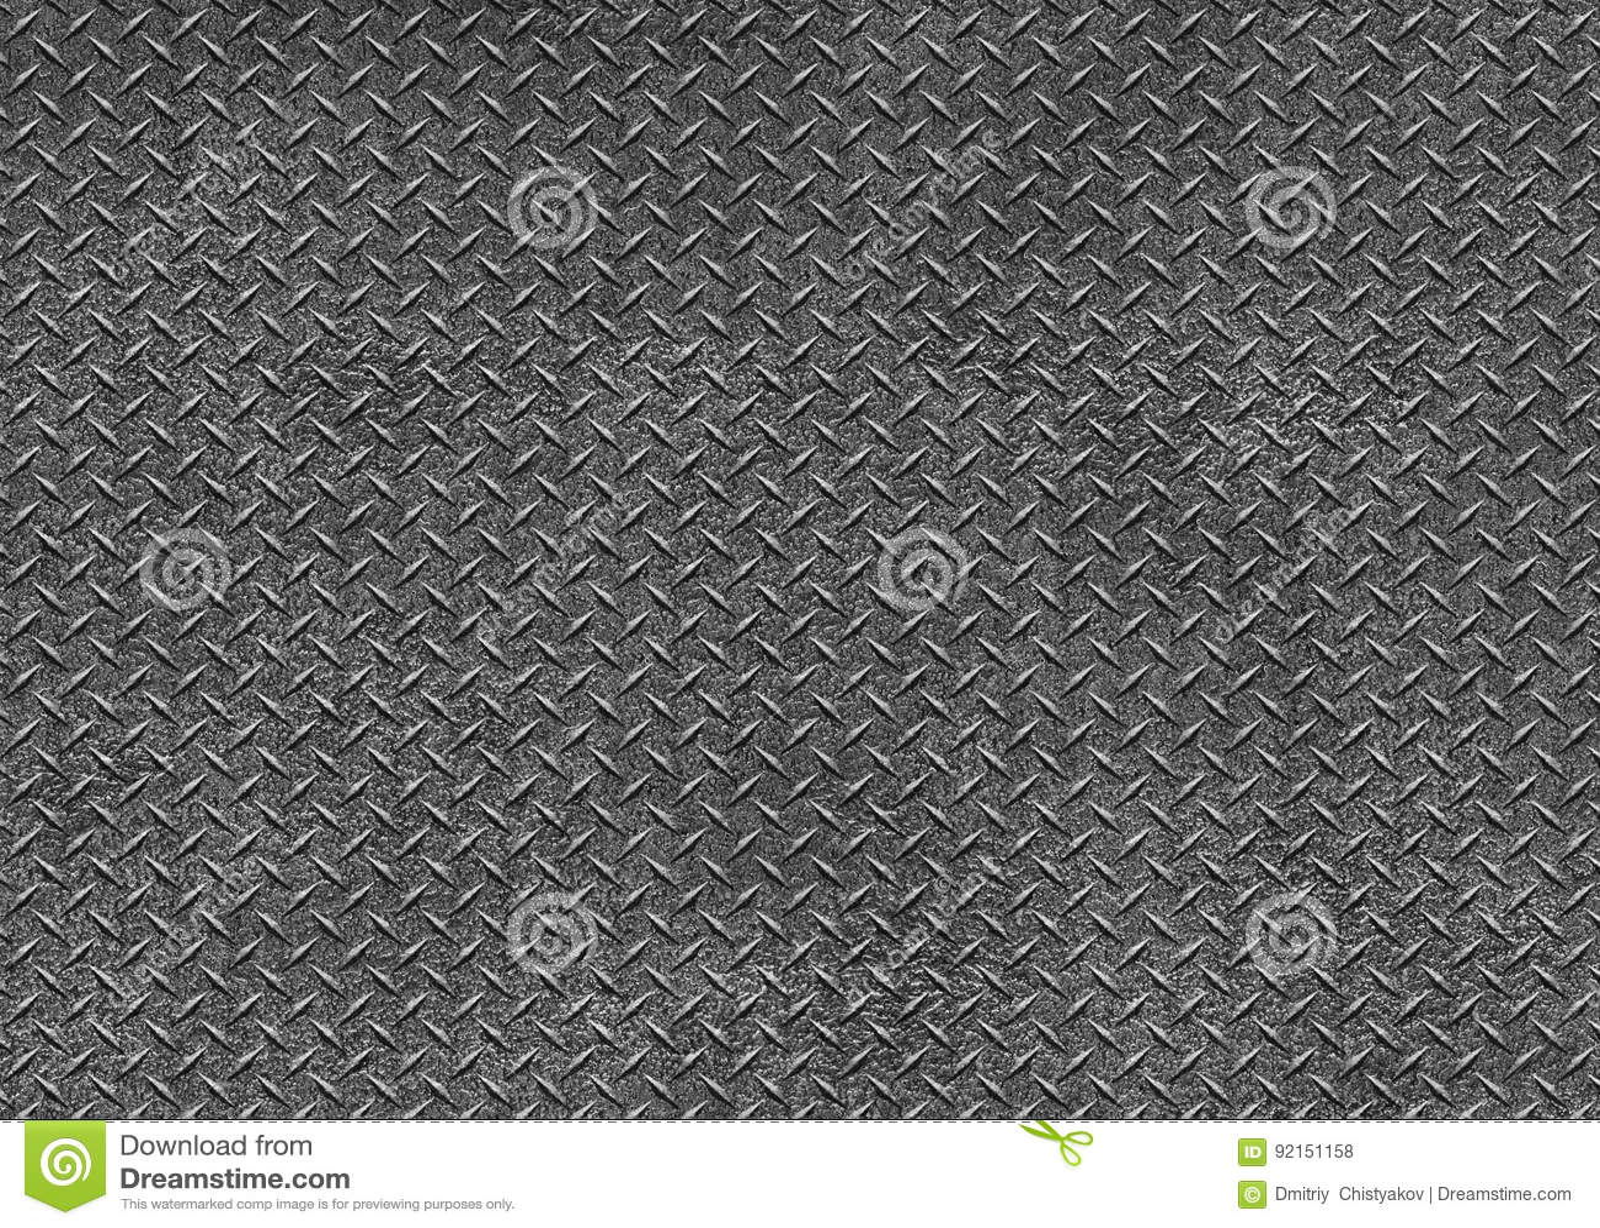 Metal plate texture, Iron sheet, Seamless pattern background. il